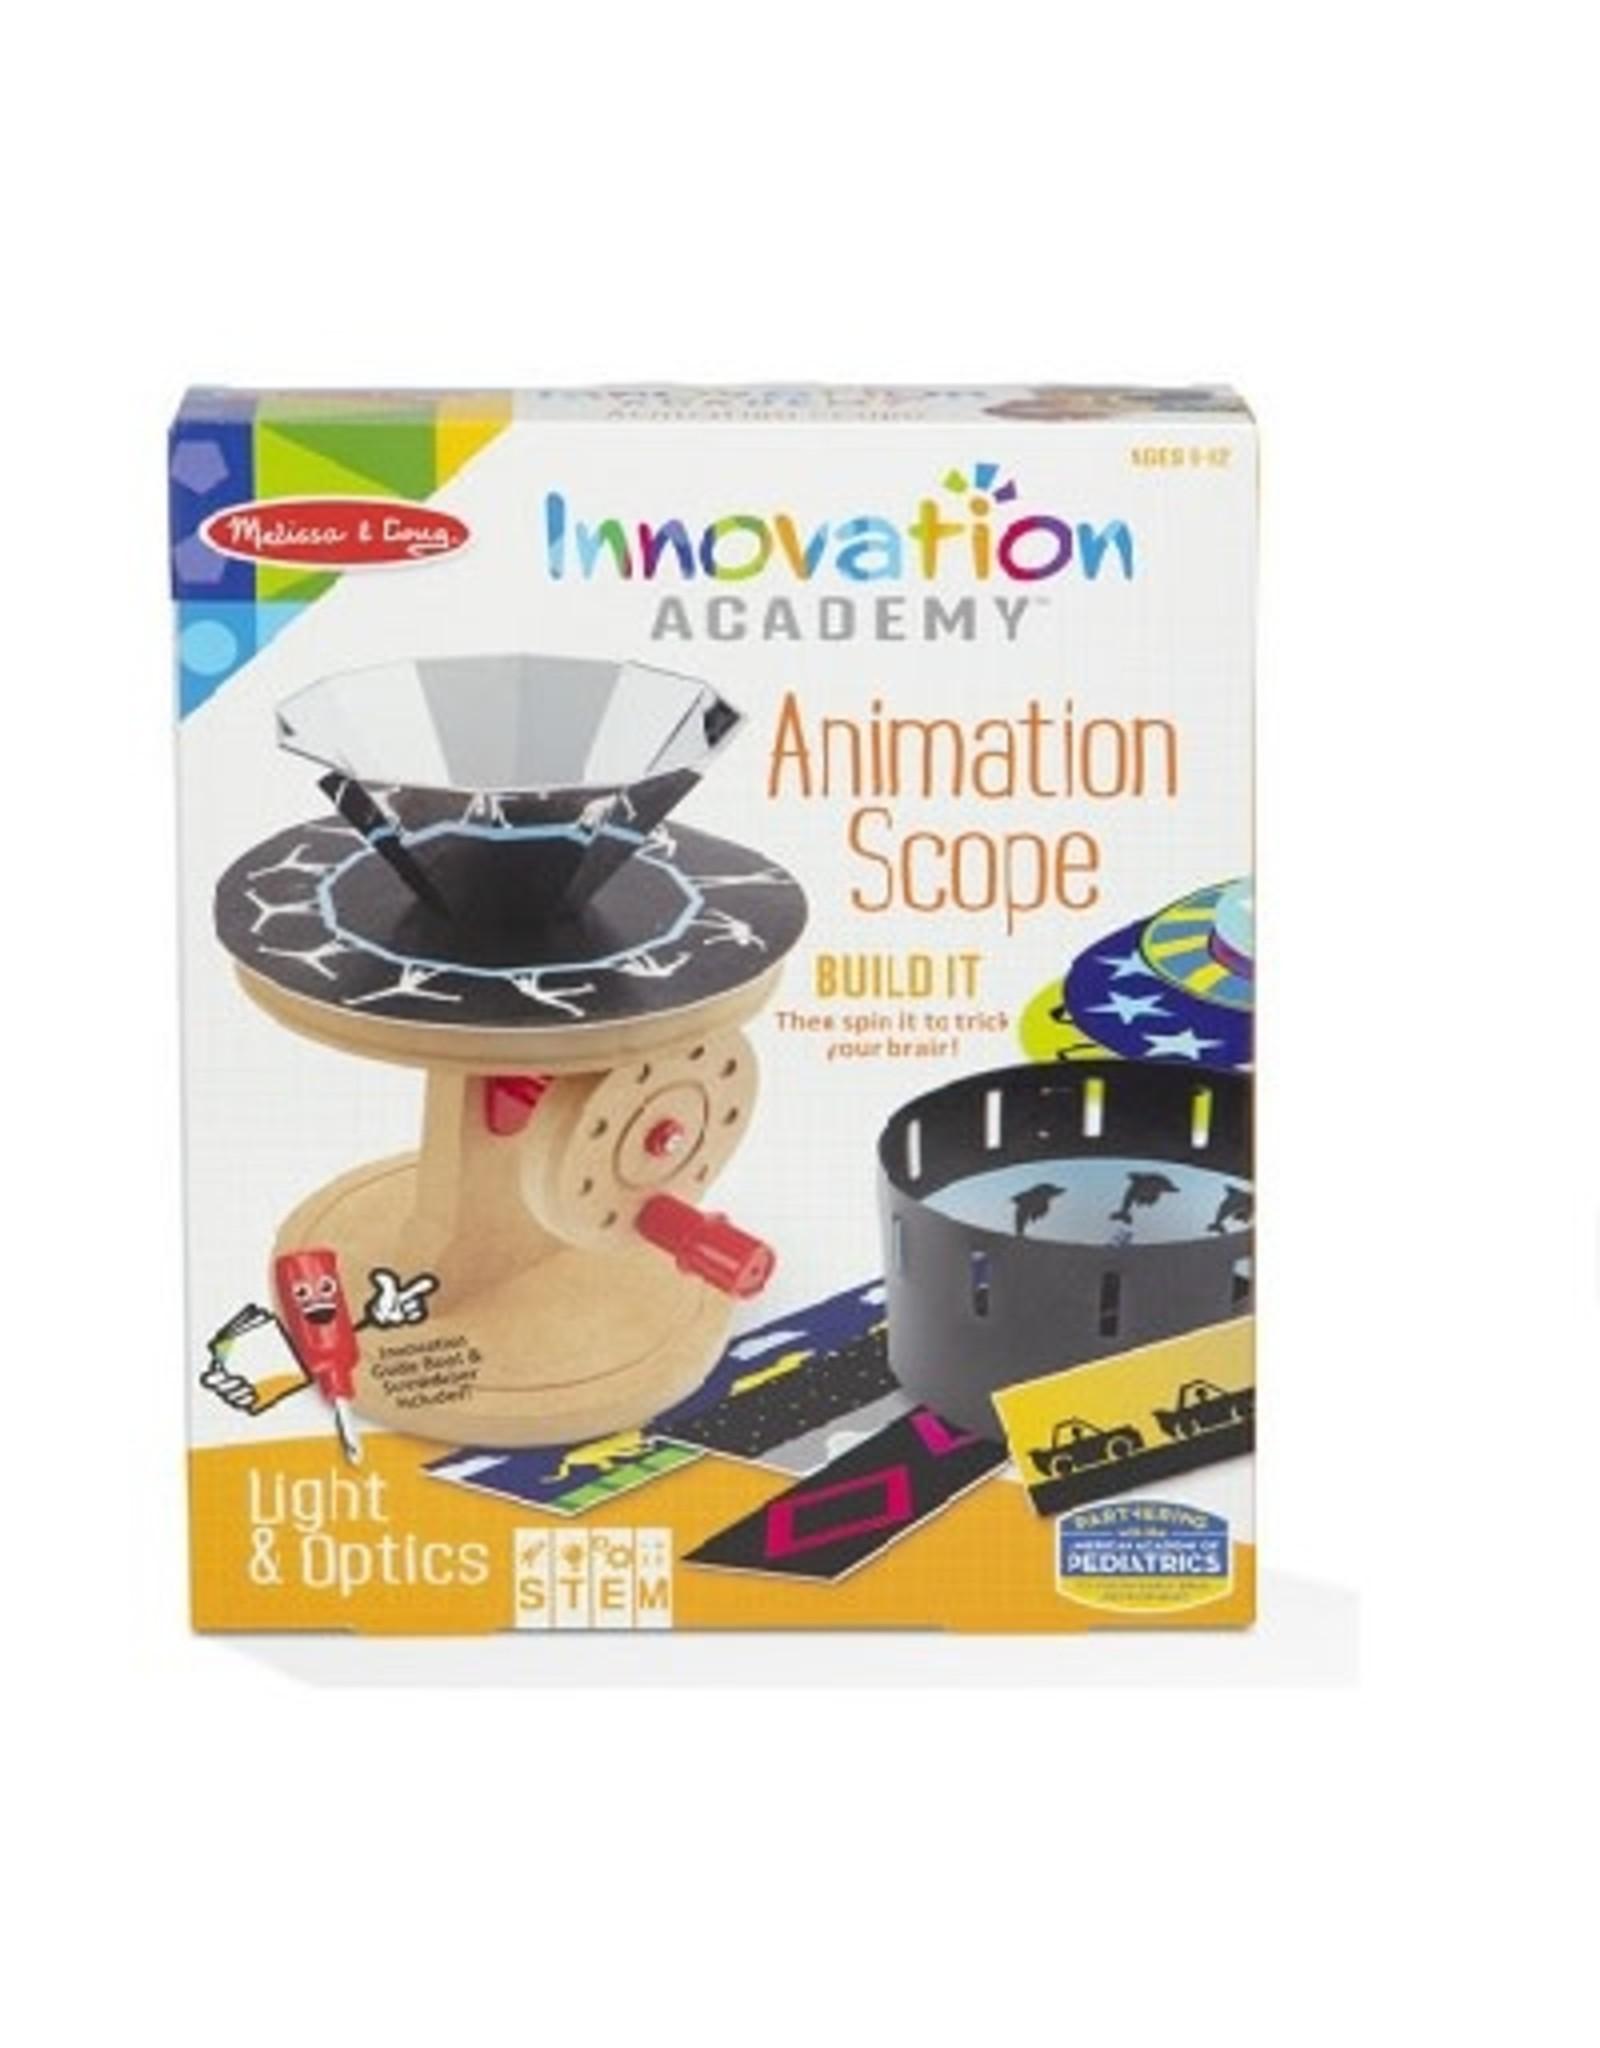 Melissa & Doug Innovation Academy (Animation Scope)